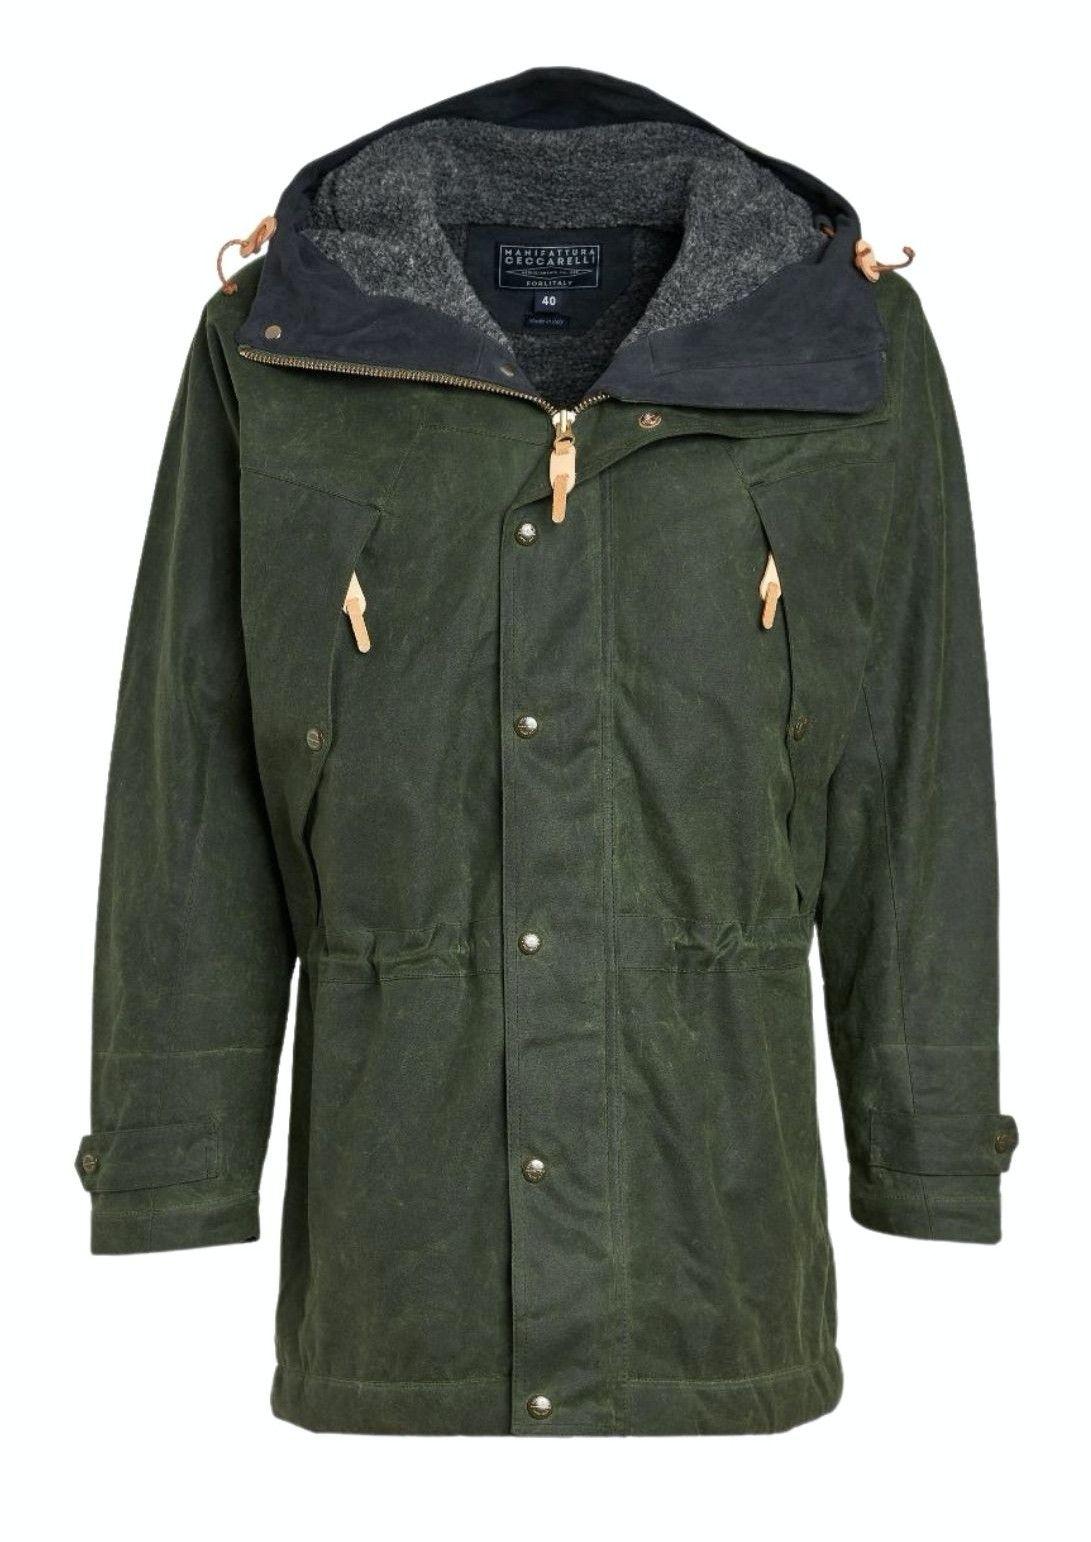 MANIFATTURA CECCARELLI - Herren Jacke - Long Mountain Jacket - Fleece Lining - Dark Green